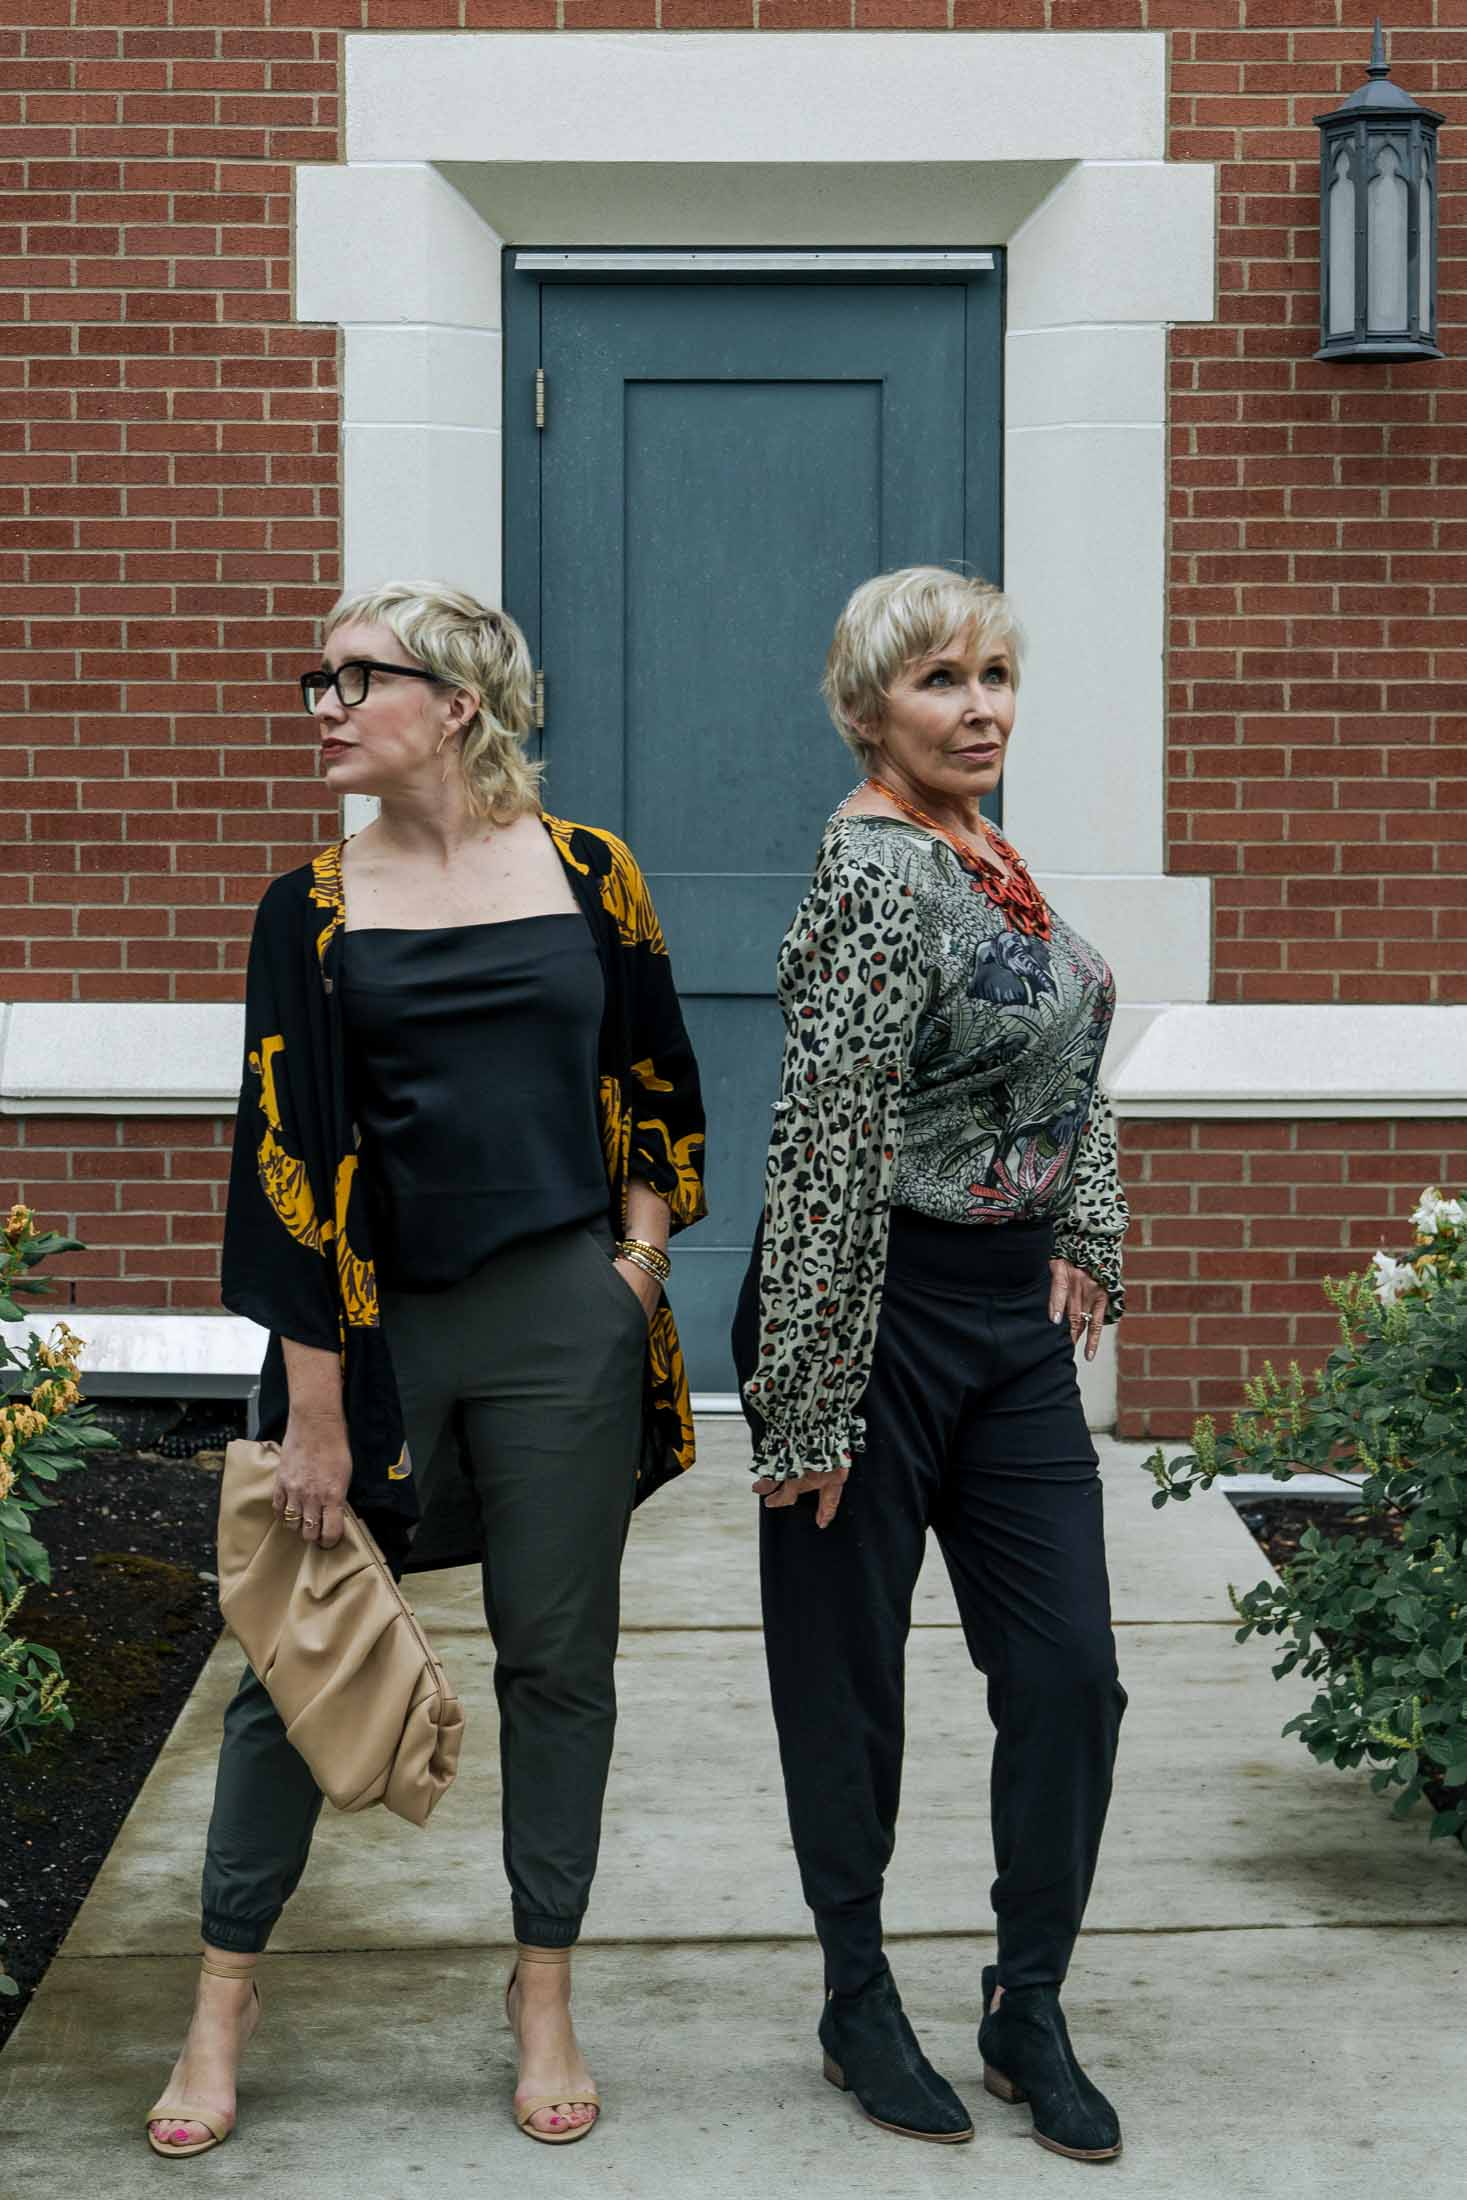 My 60-something mom & I both ADORE Athleta joggers, so we're each styling 'em up -- dressy & casual, black & green. So FUN!